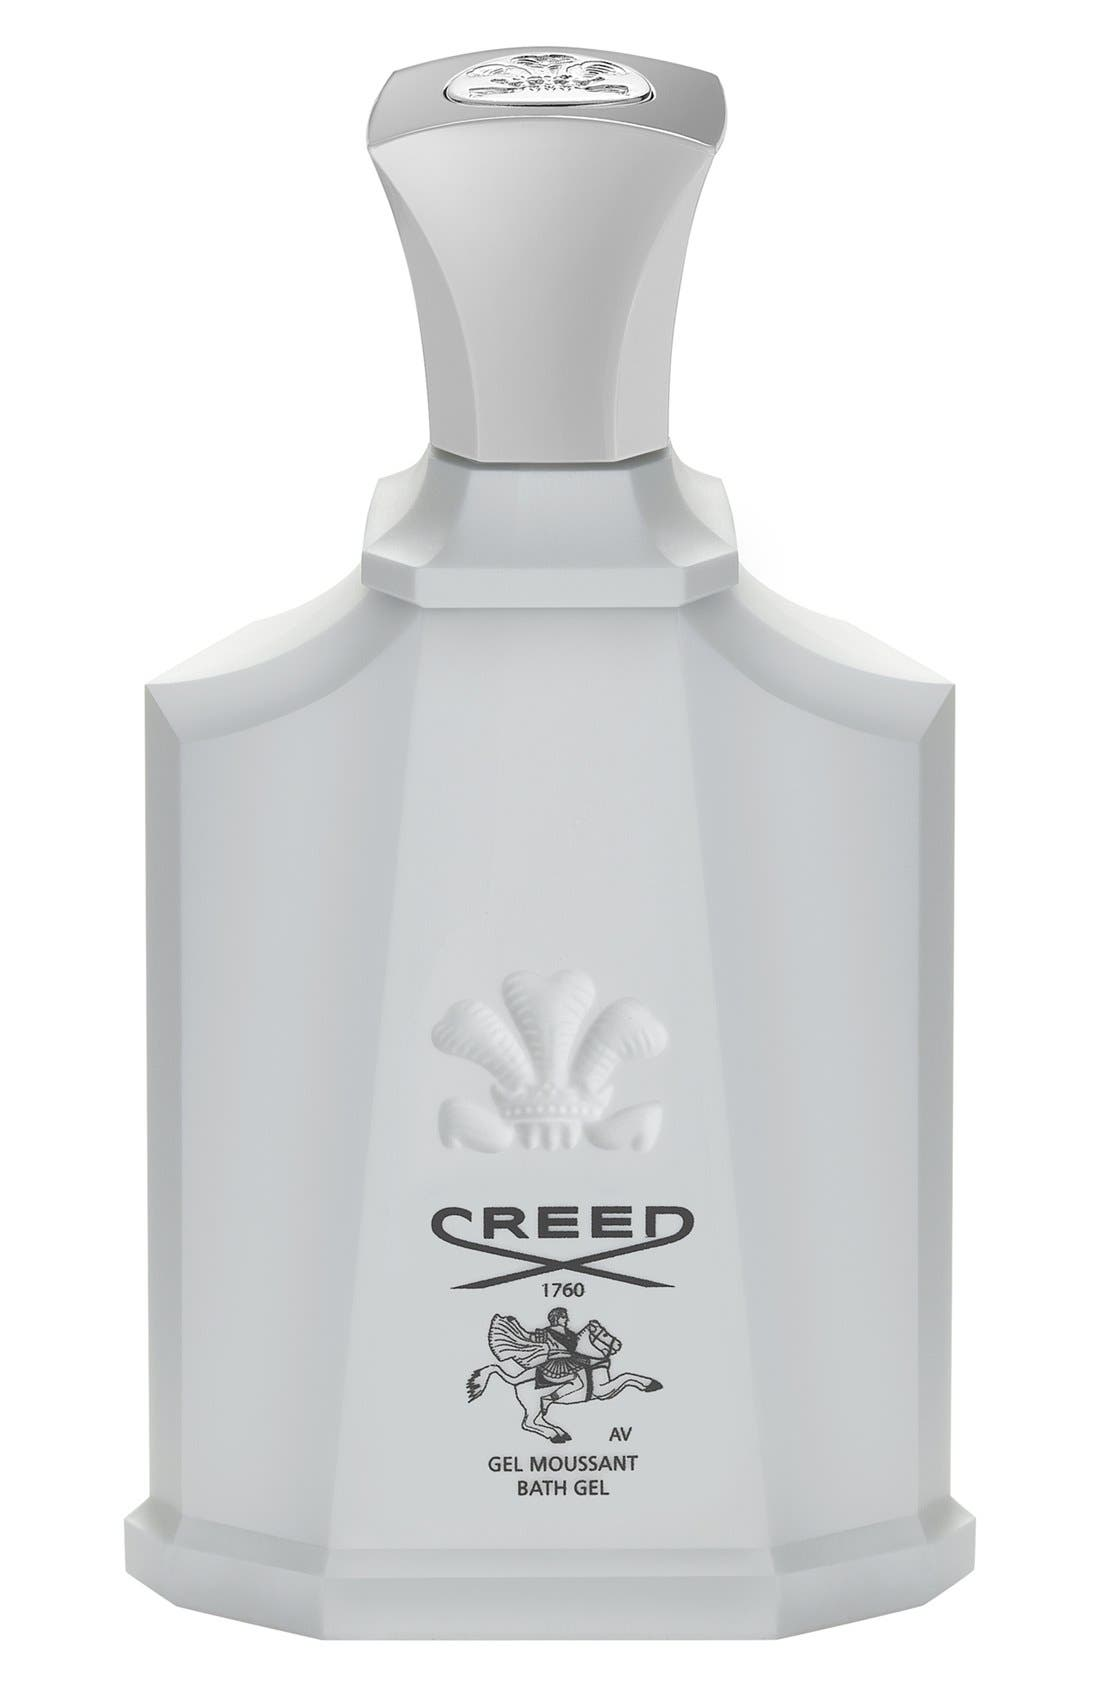 Creed 'Aventus' Shower Gel